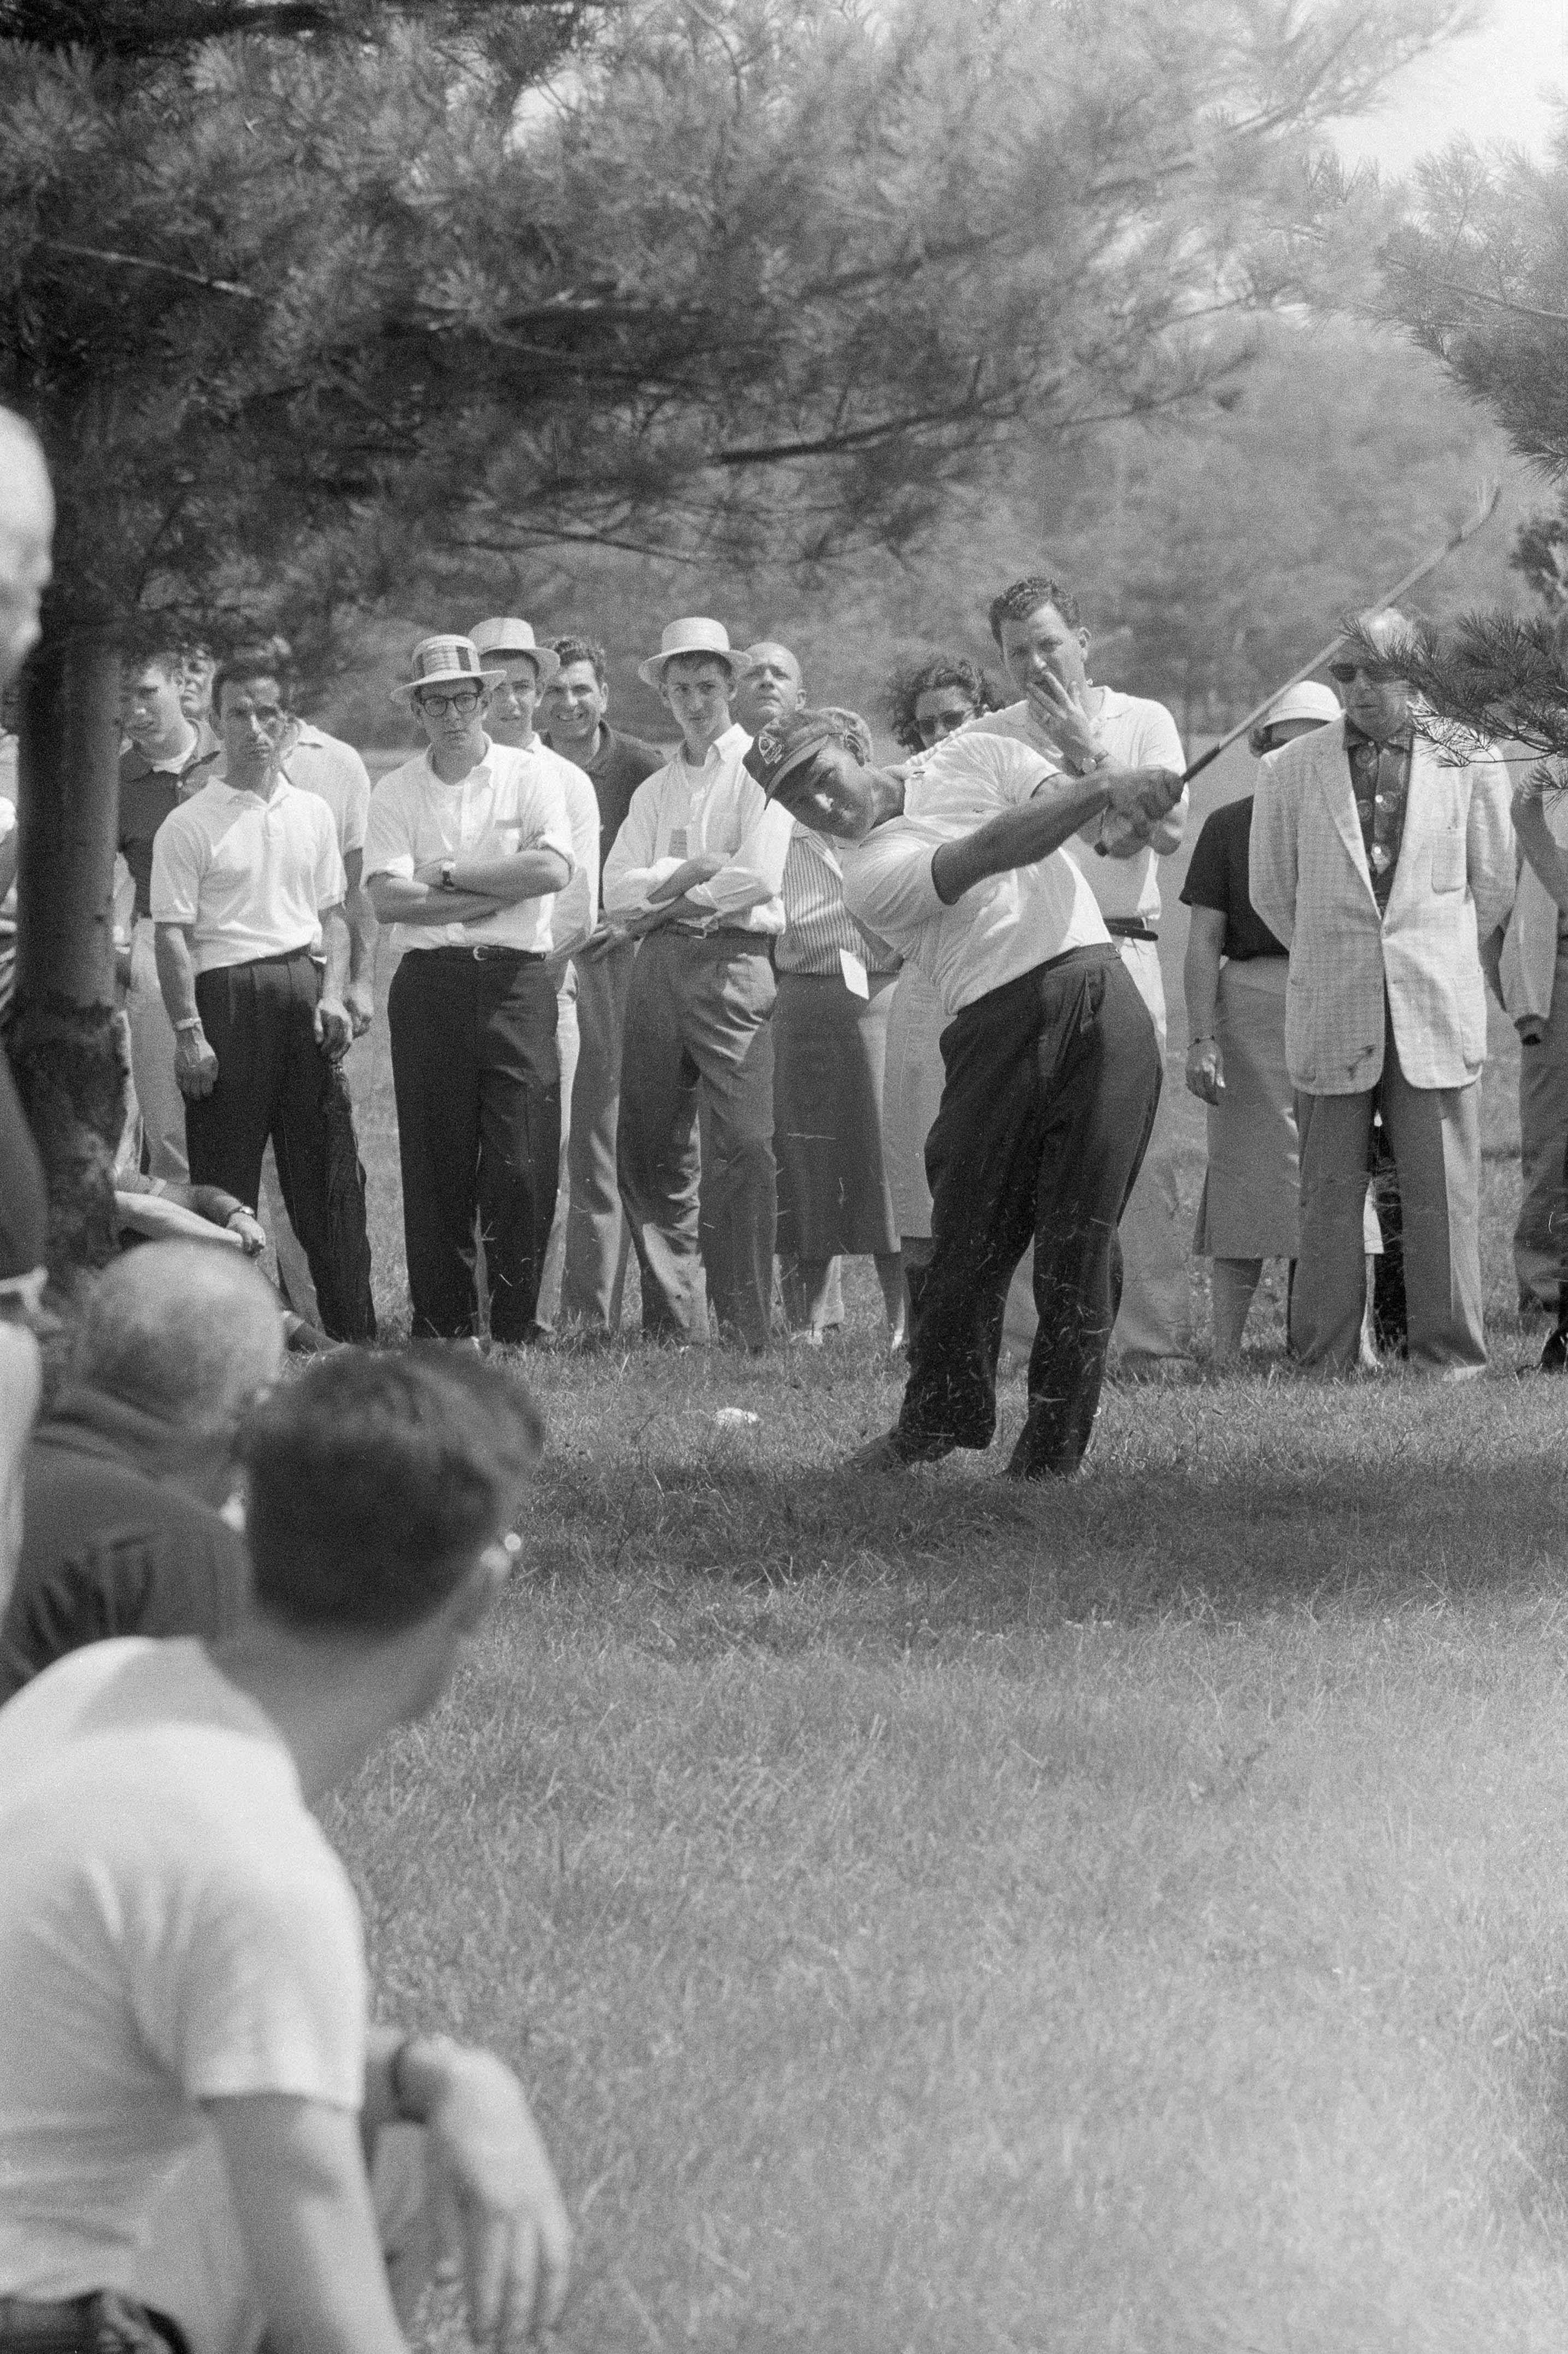 7. 1956: Palmer's first U.S. win